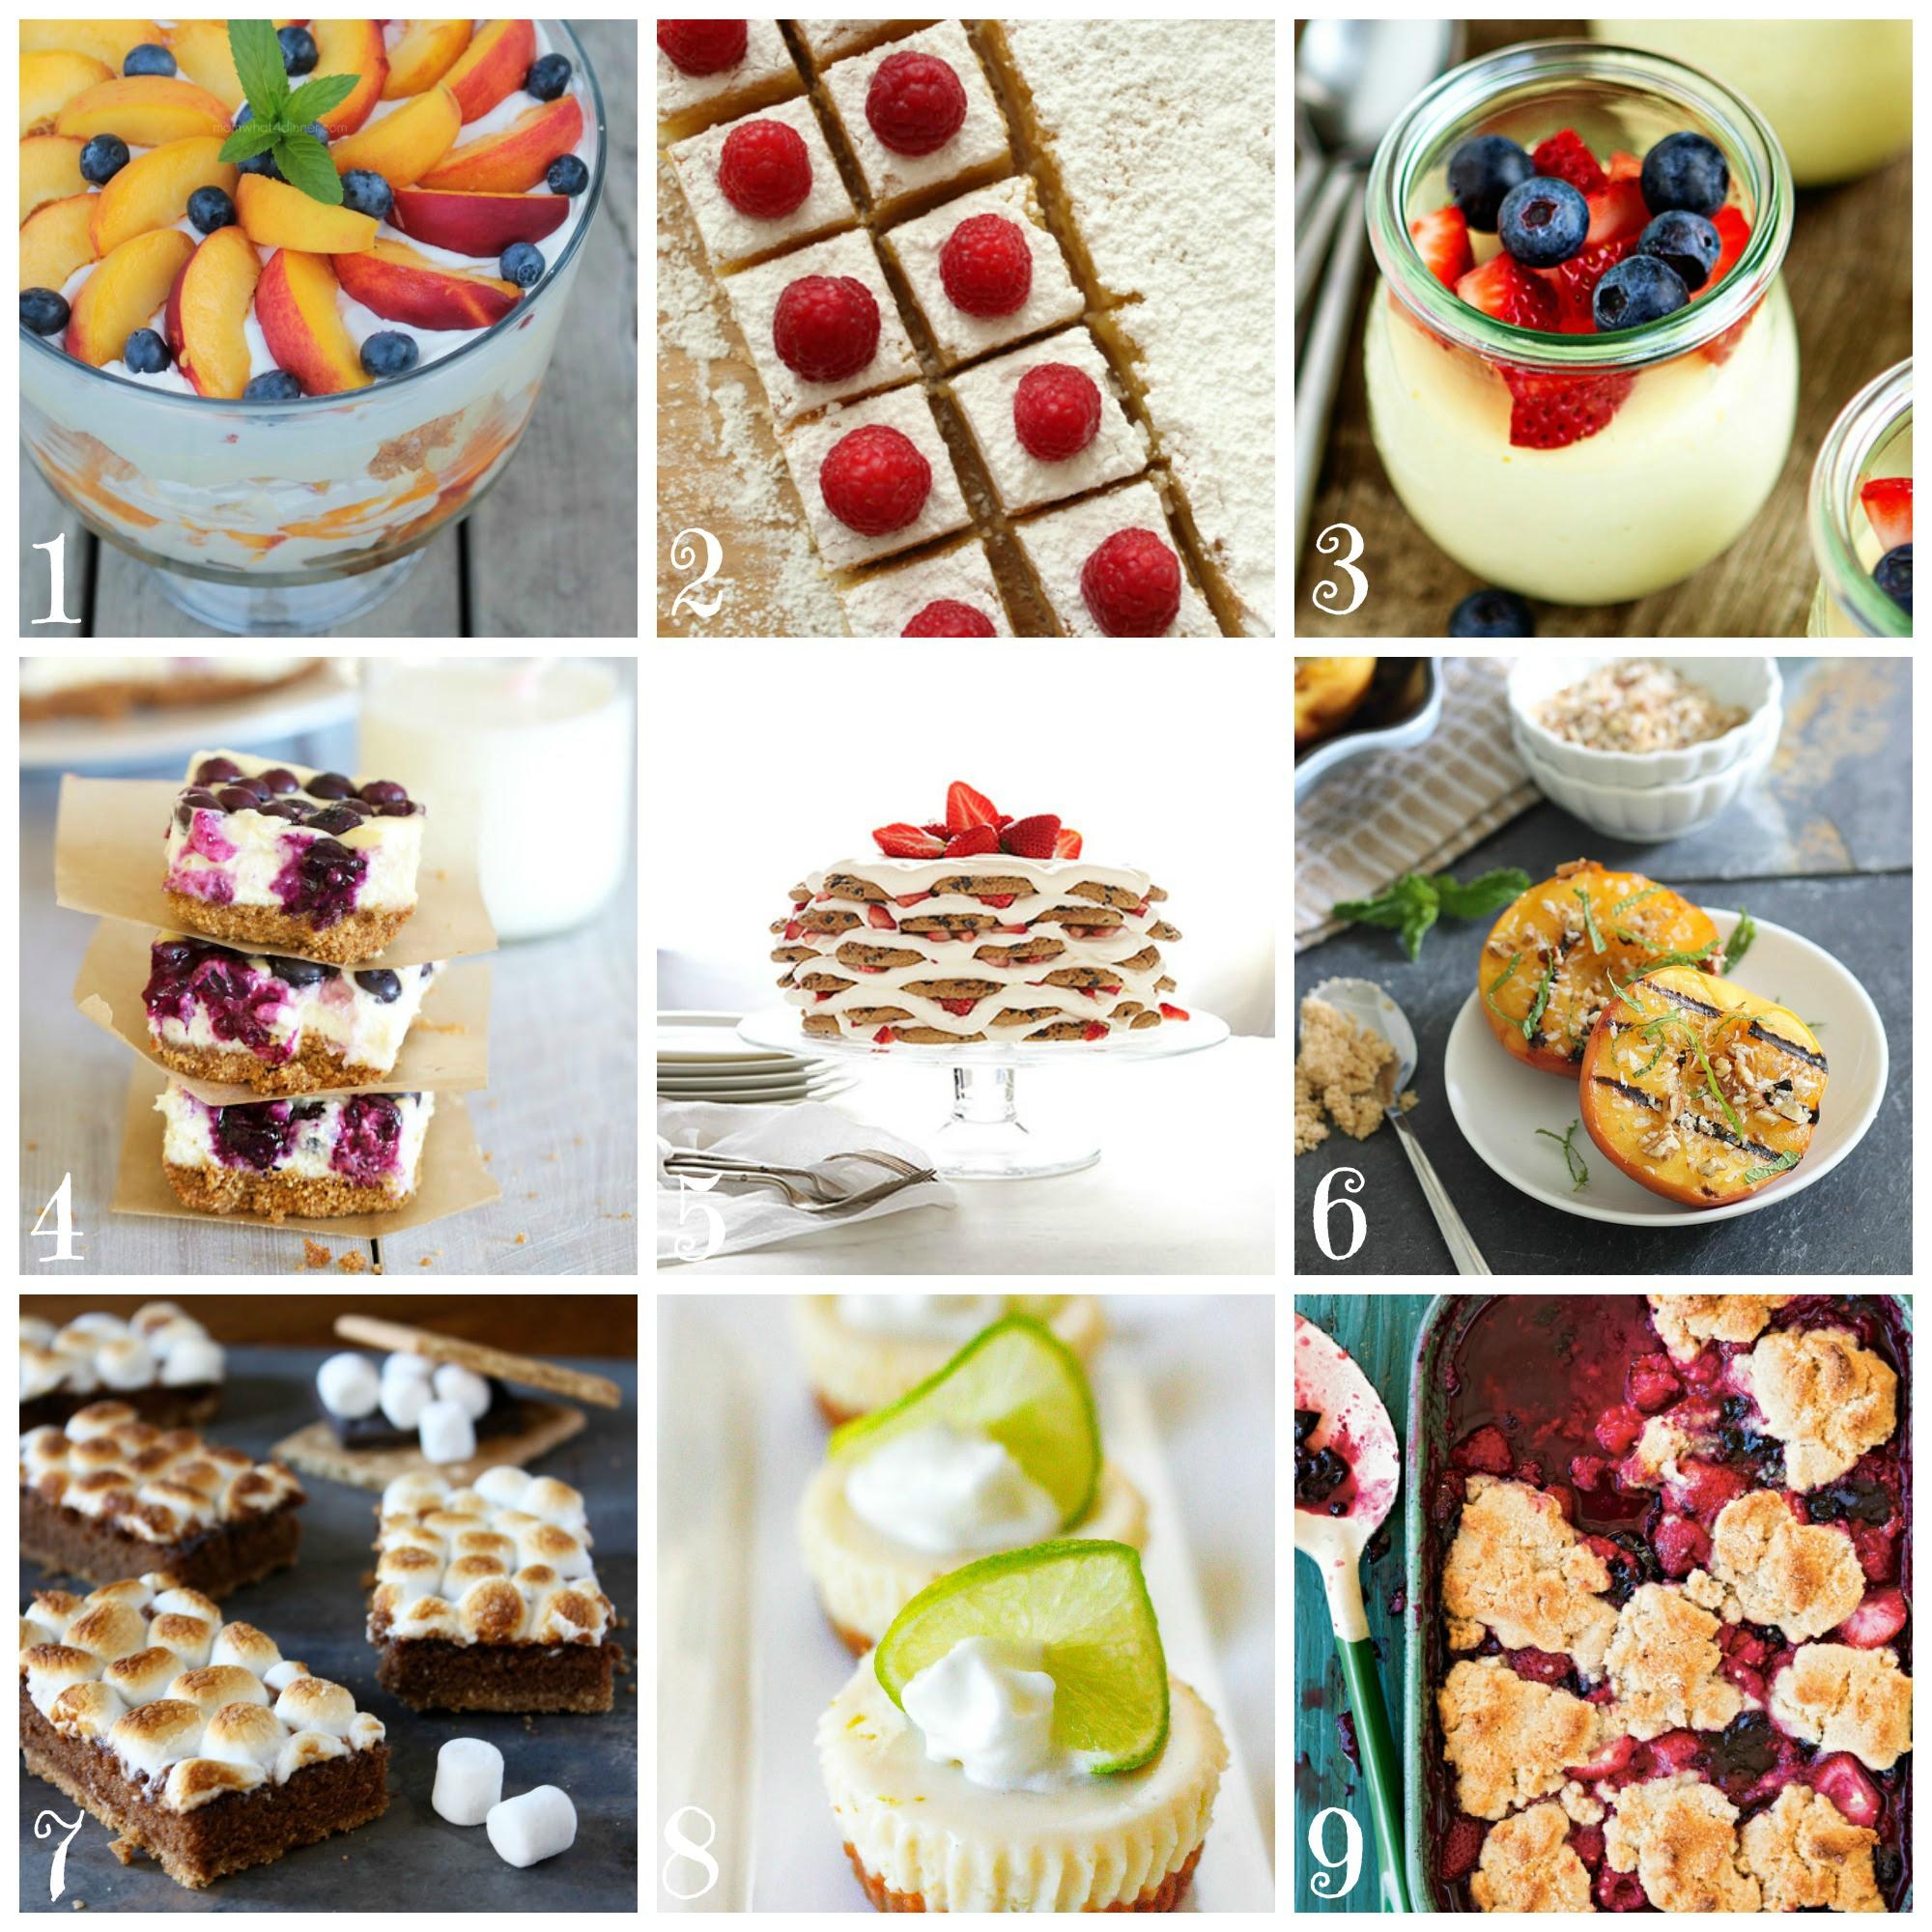 Best Summer Dessert Recipes Cakejournal Com